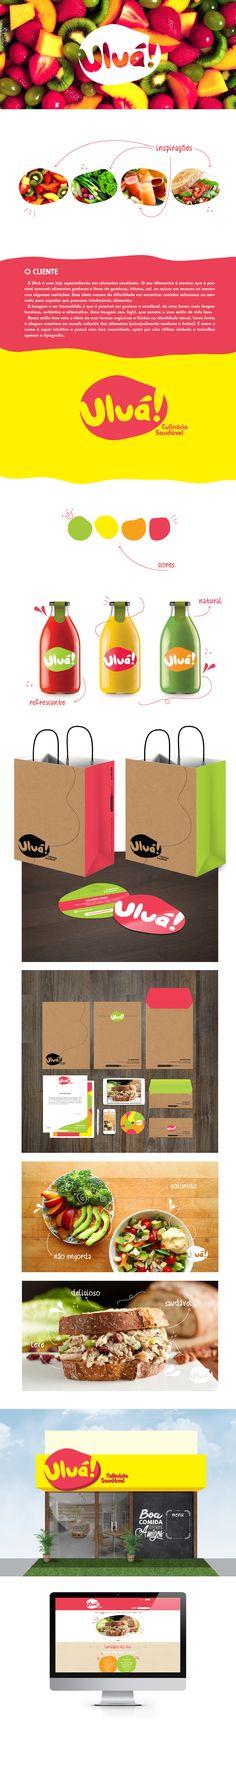 Identidade Visual criada para a loja Uluá - Culinária Saudável. Projeto…